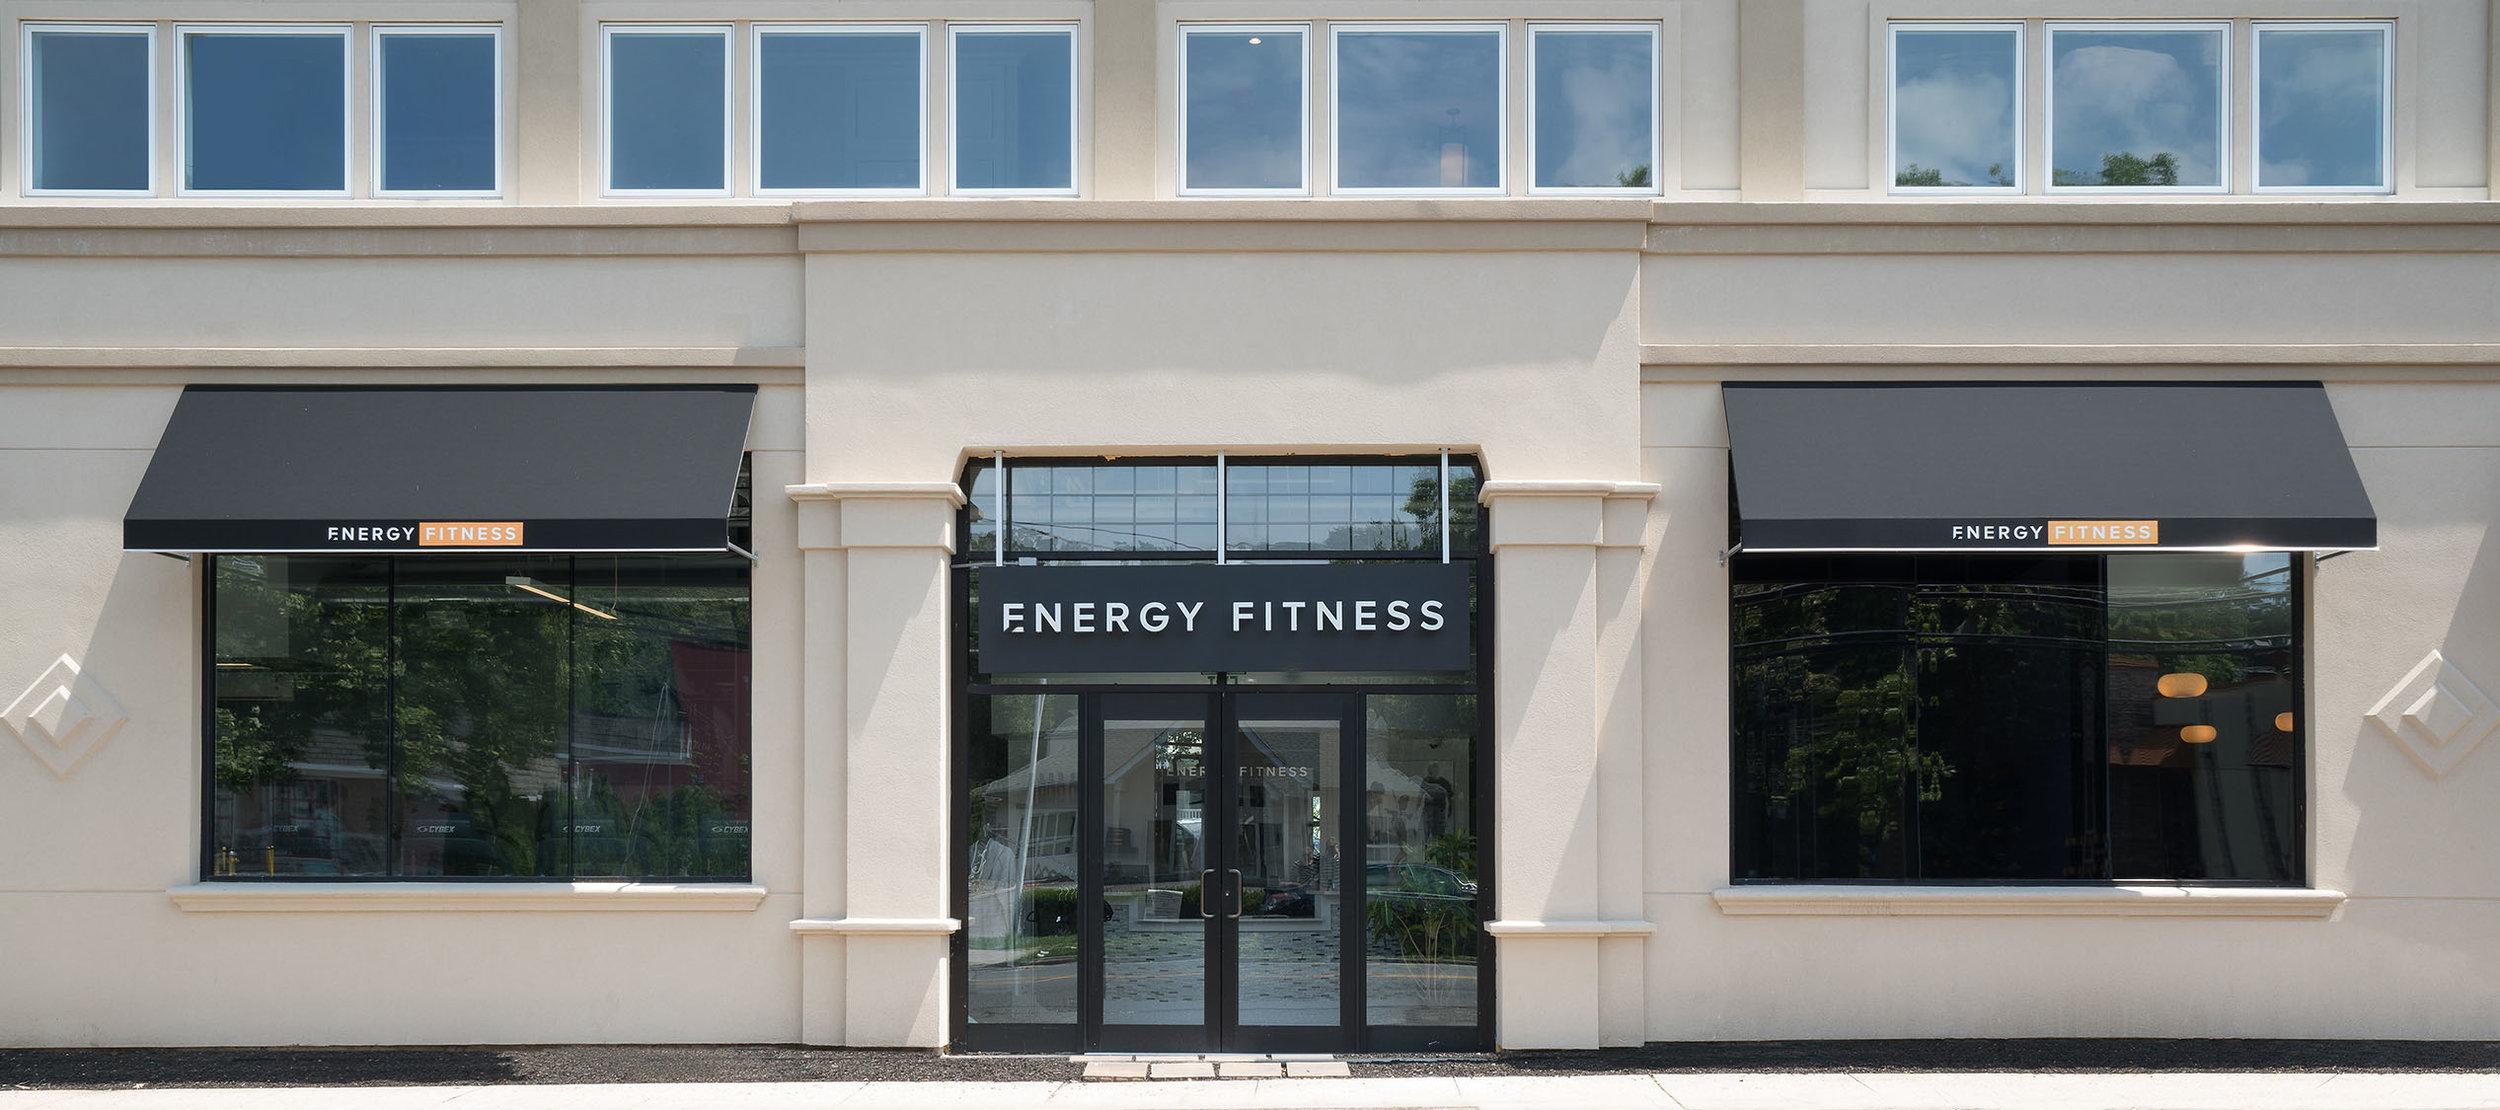 EnergyFitness_Sign.jpg